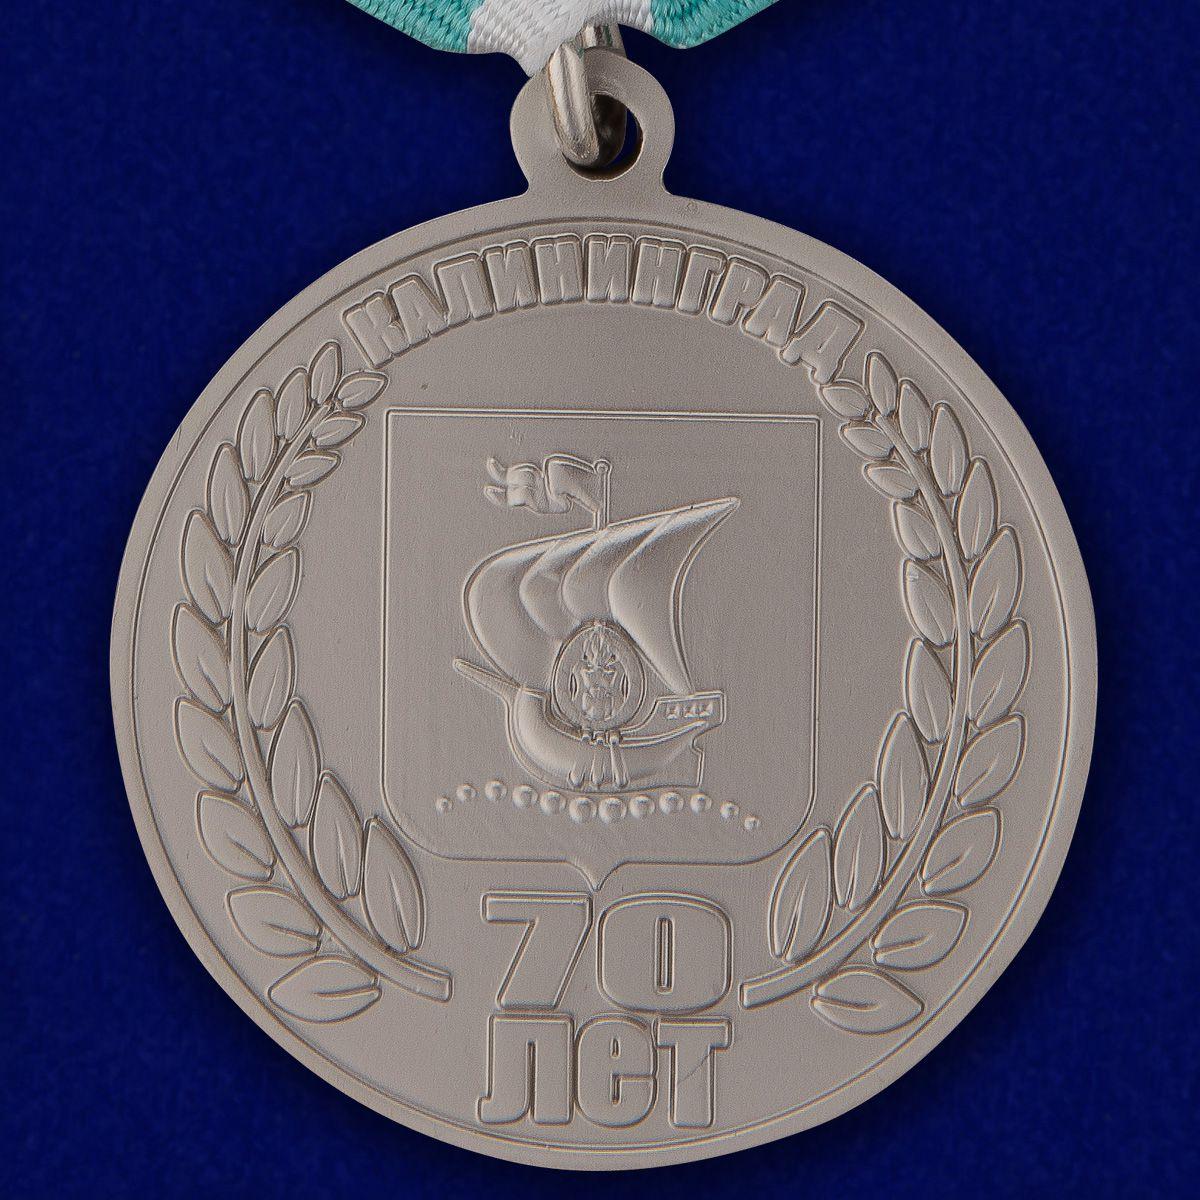 Памятная медаль 70 лет Калининграду